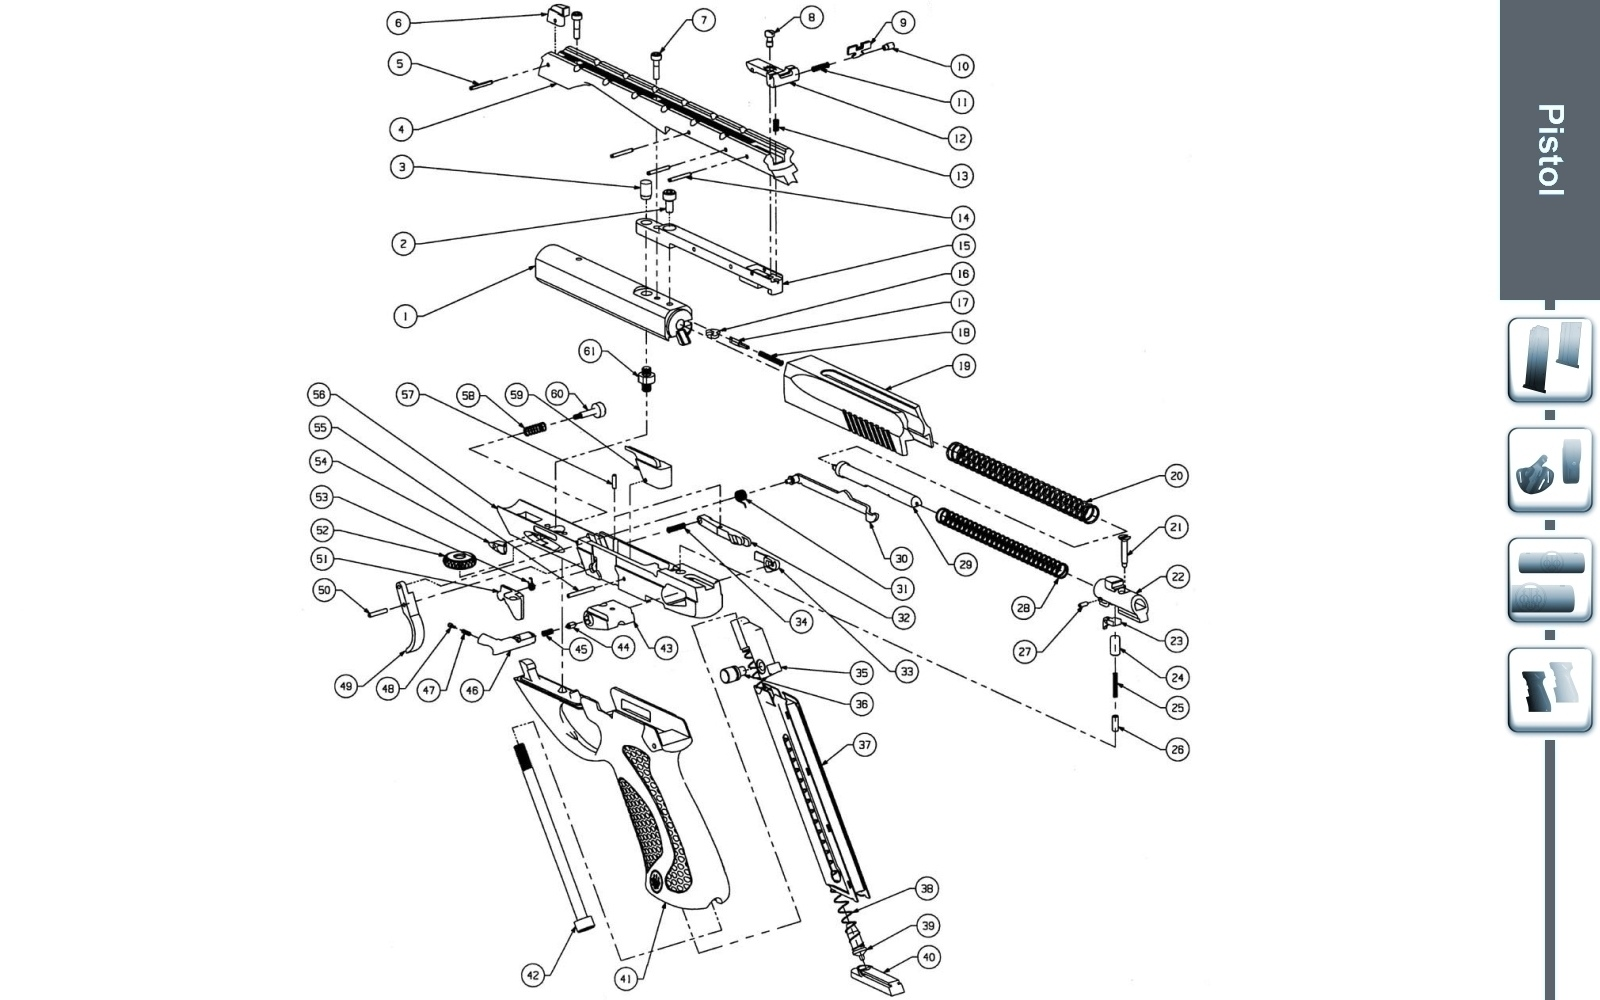 [DH_7387] Beretta 92 Parts Diagram Free Diagram